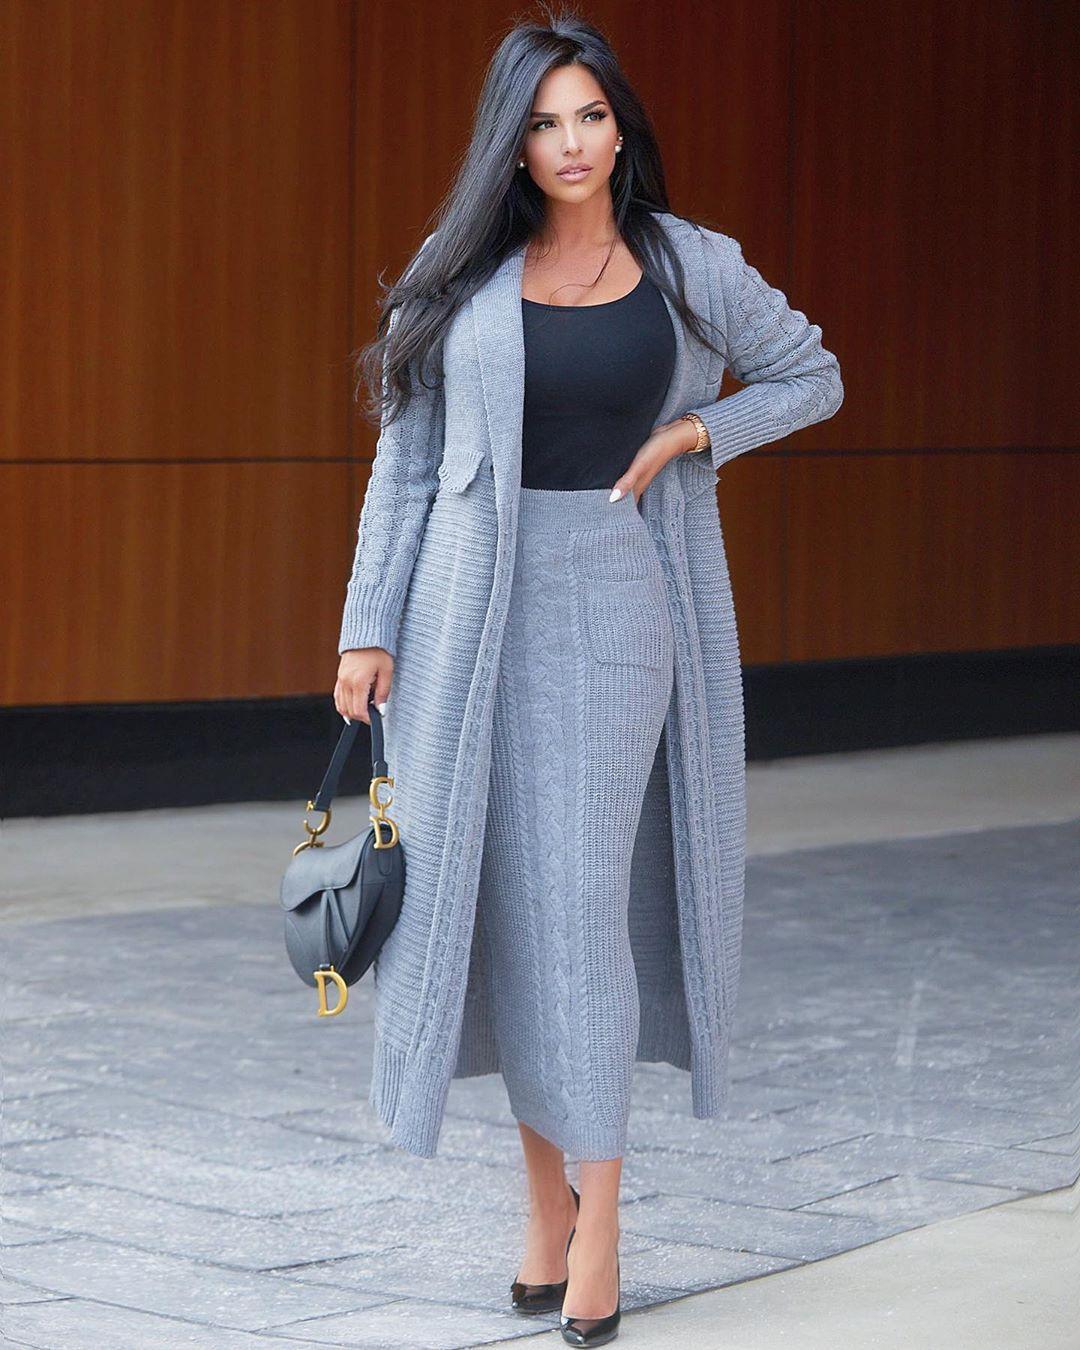 Shadi Y Cair dress matching outfit, wardrobe ideas, street fashion